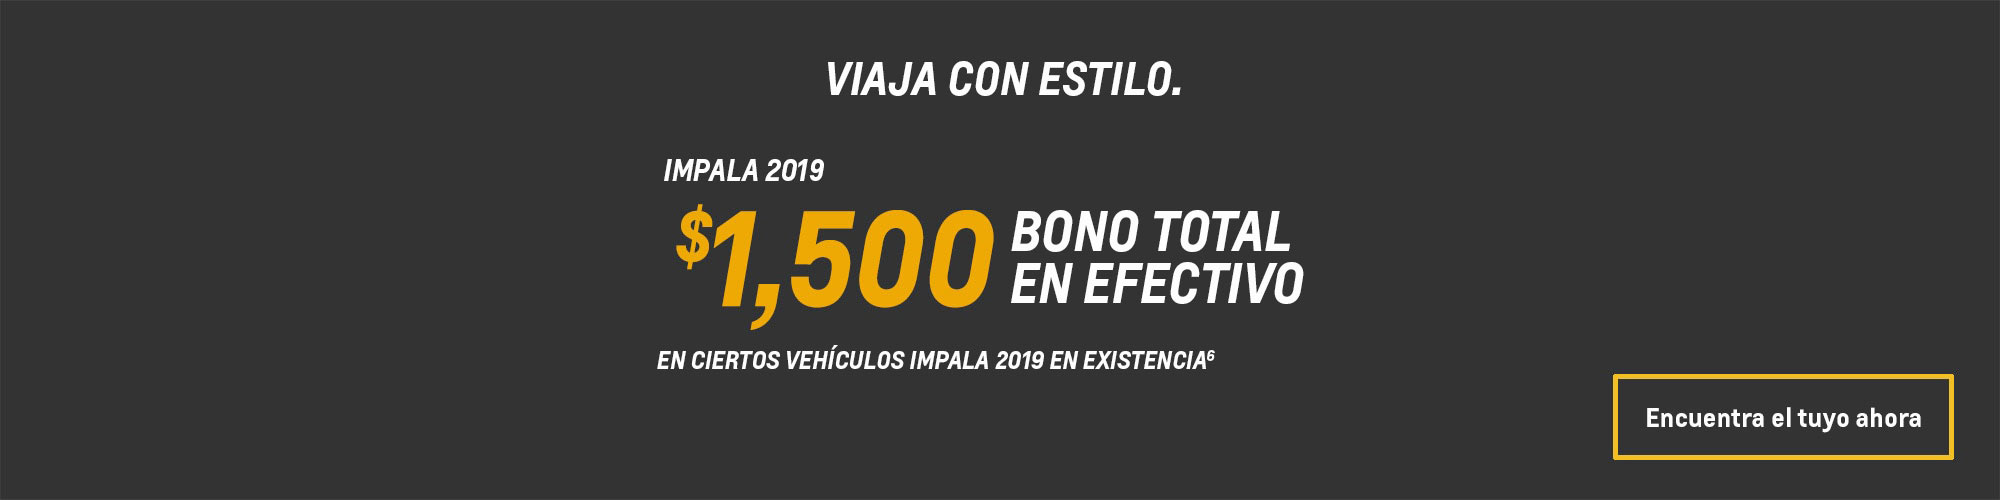 Ofertas en autos de tamaño completo Impala 2019